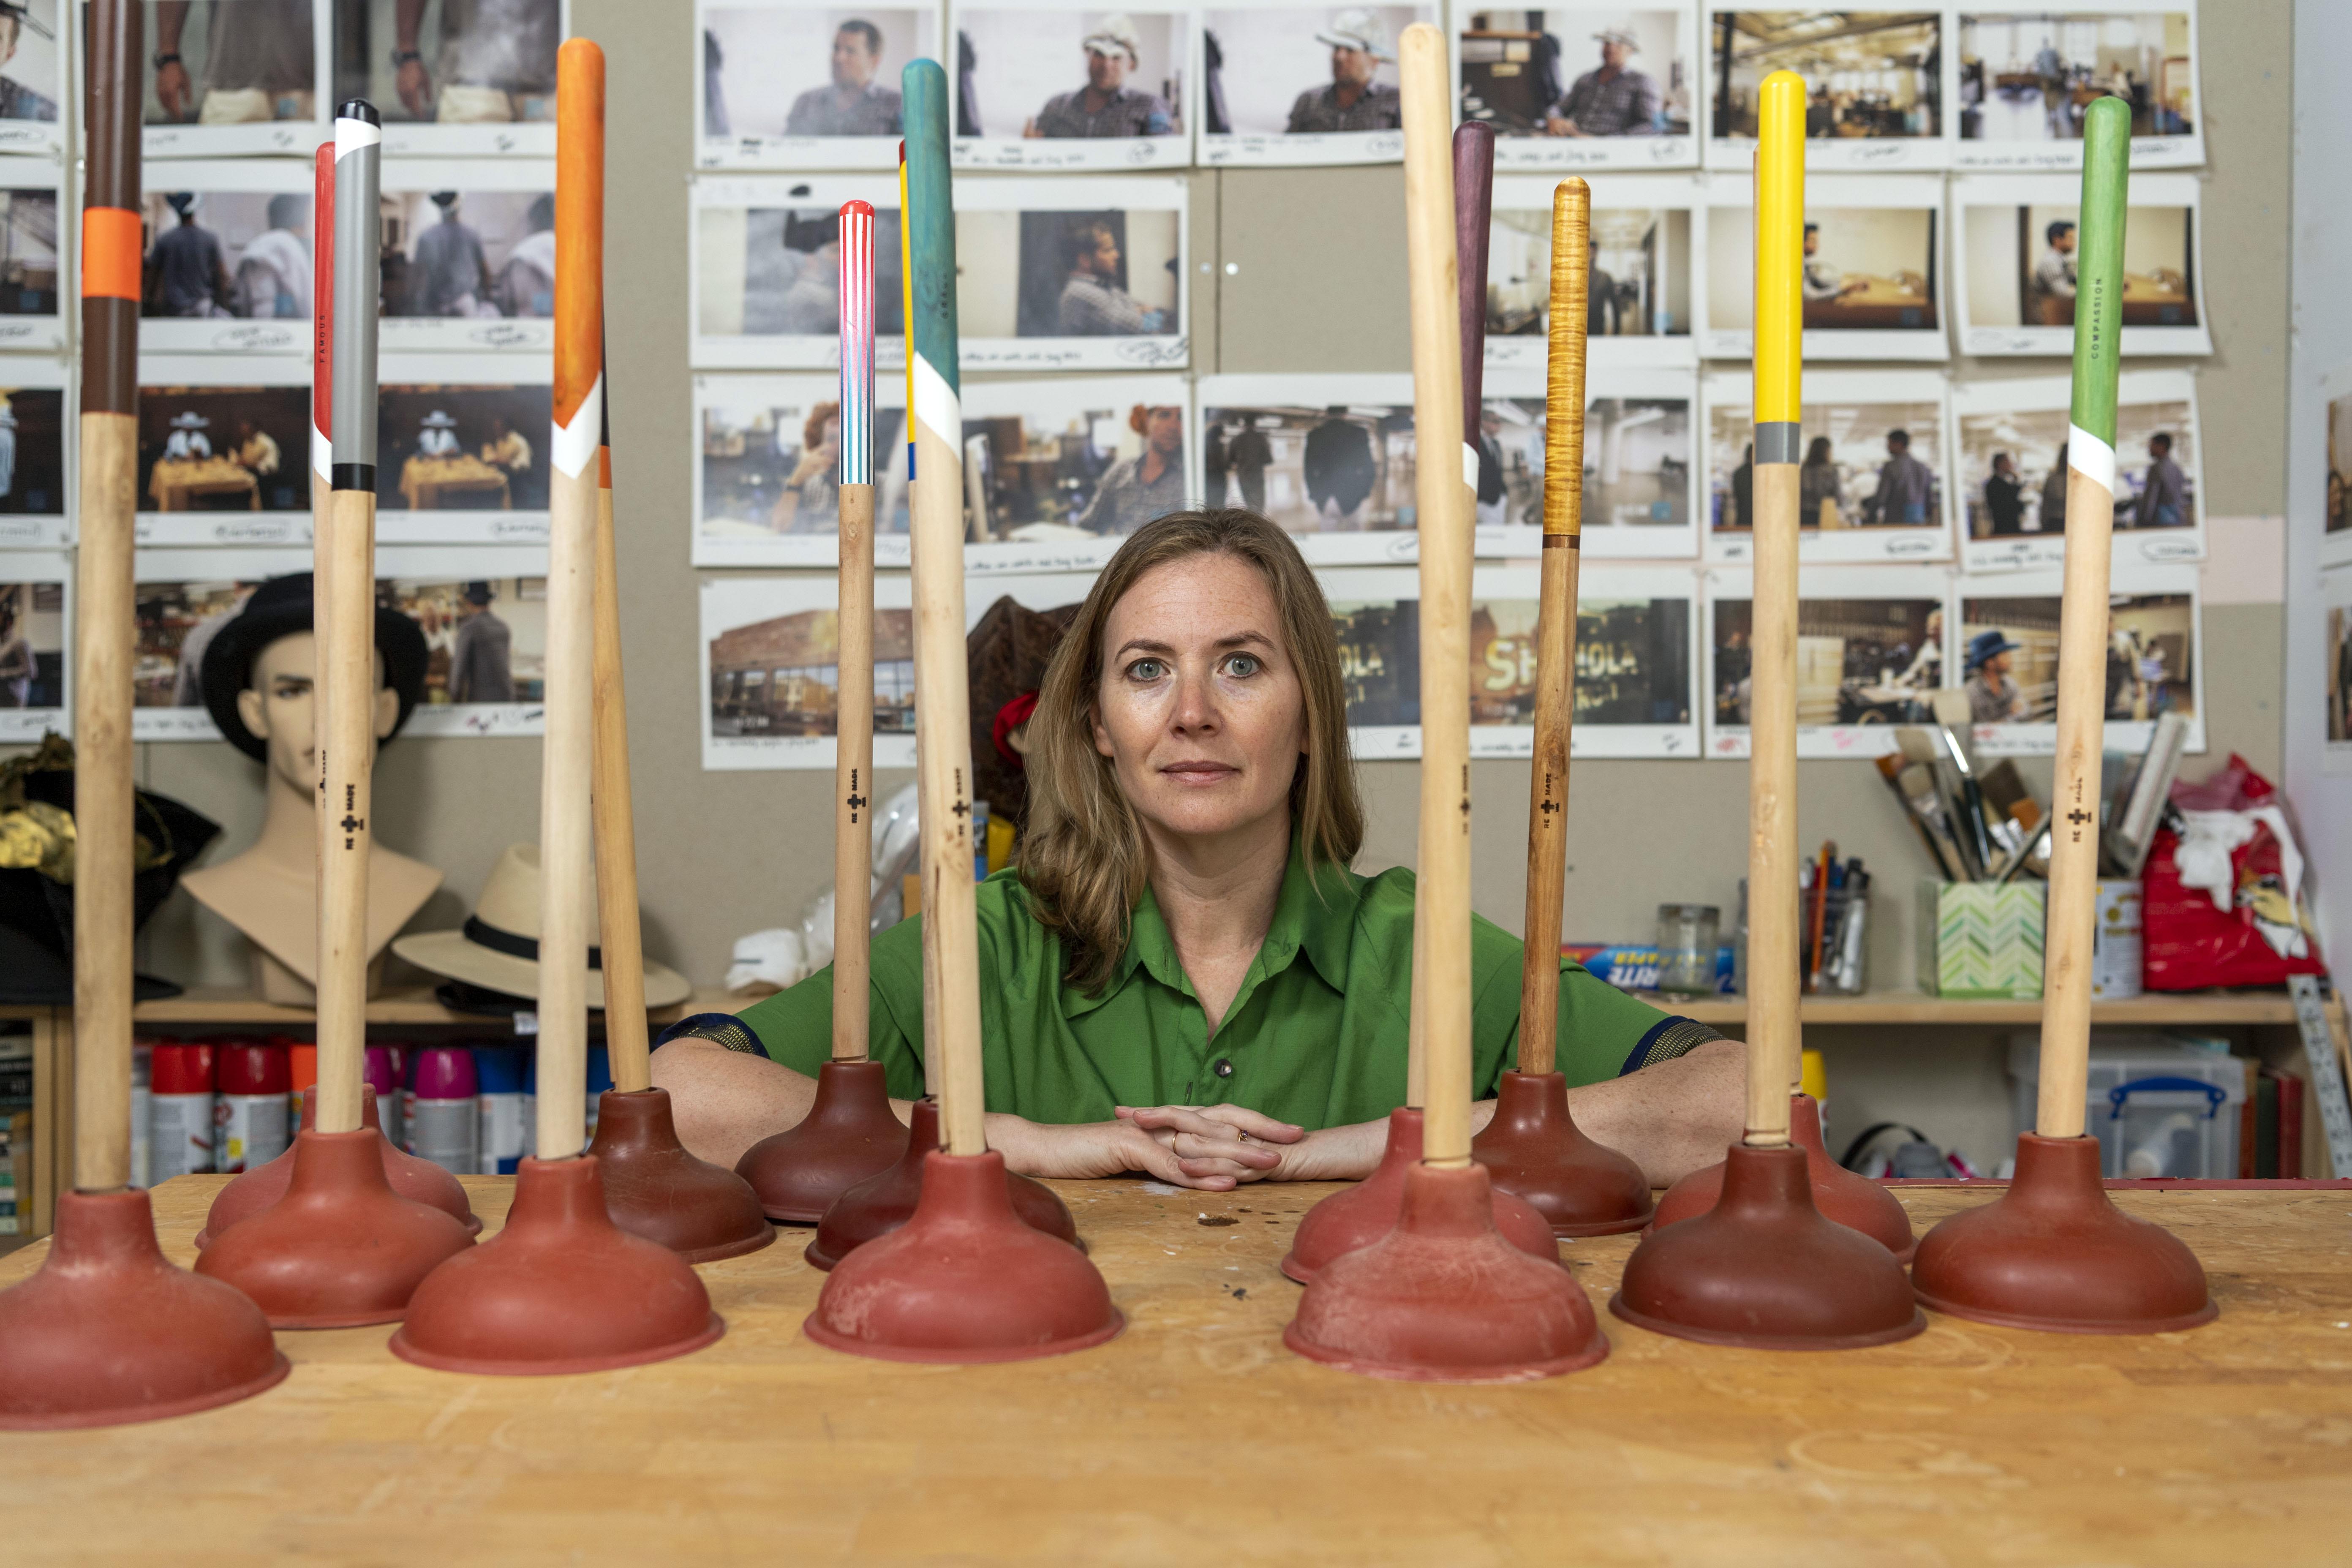 Rebekah Modrak in her studio. Image credit: Roger Hart, Michigan Photography